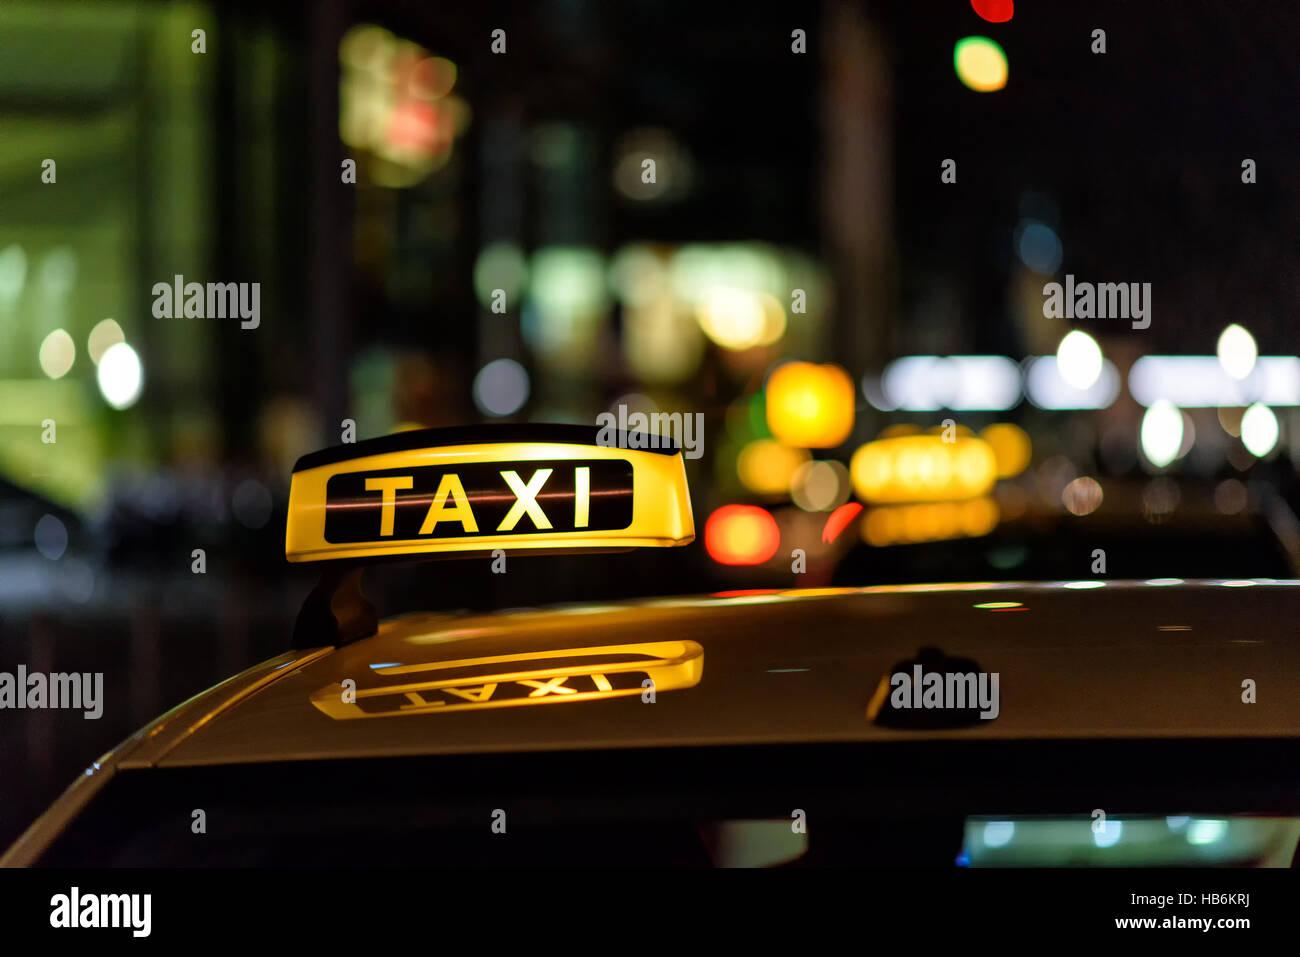 Cab - Stock Image